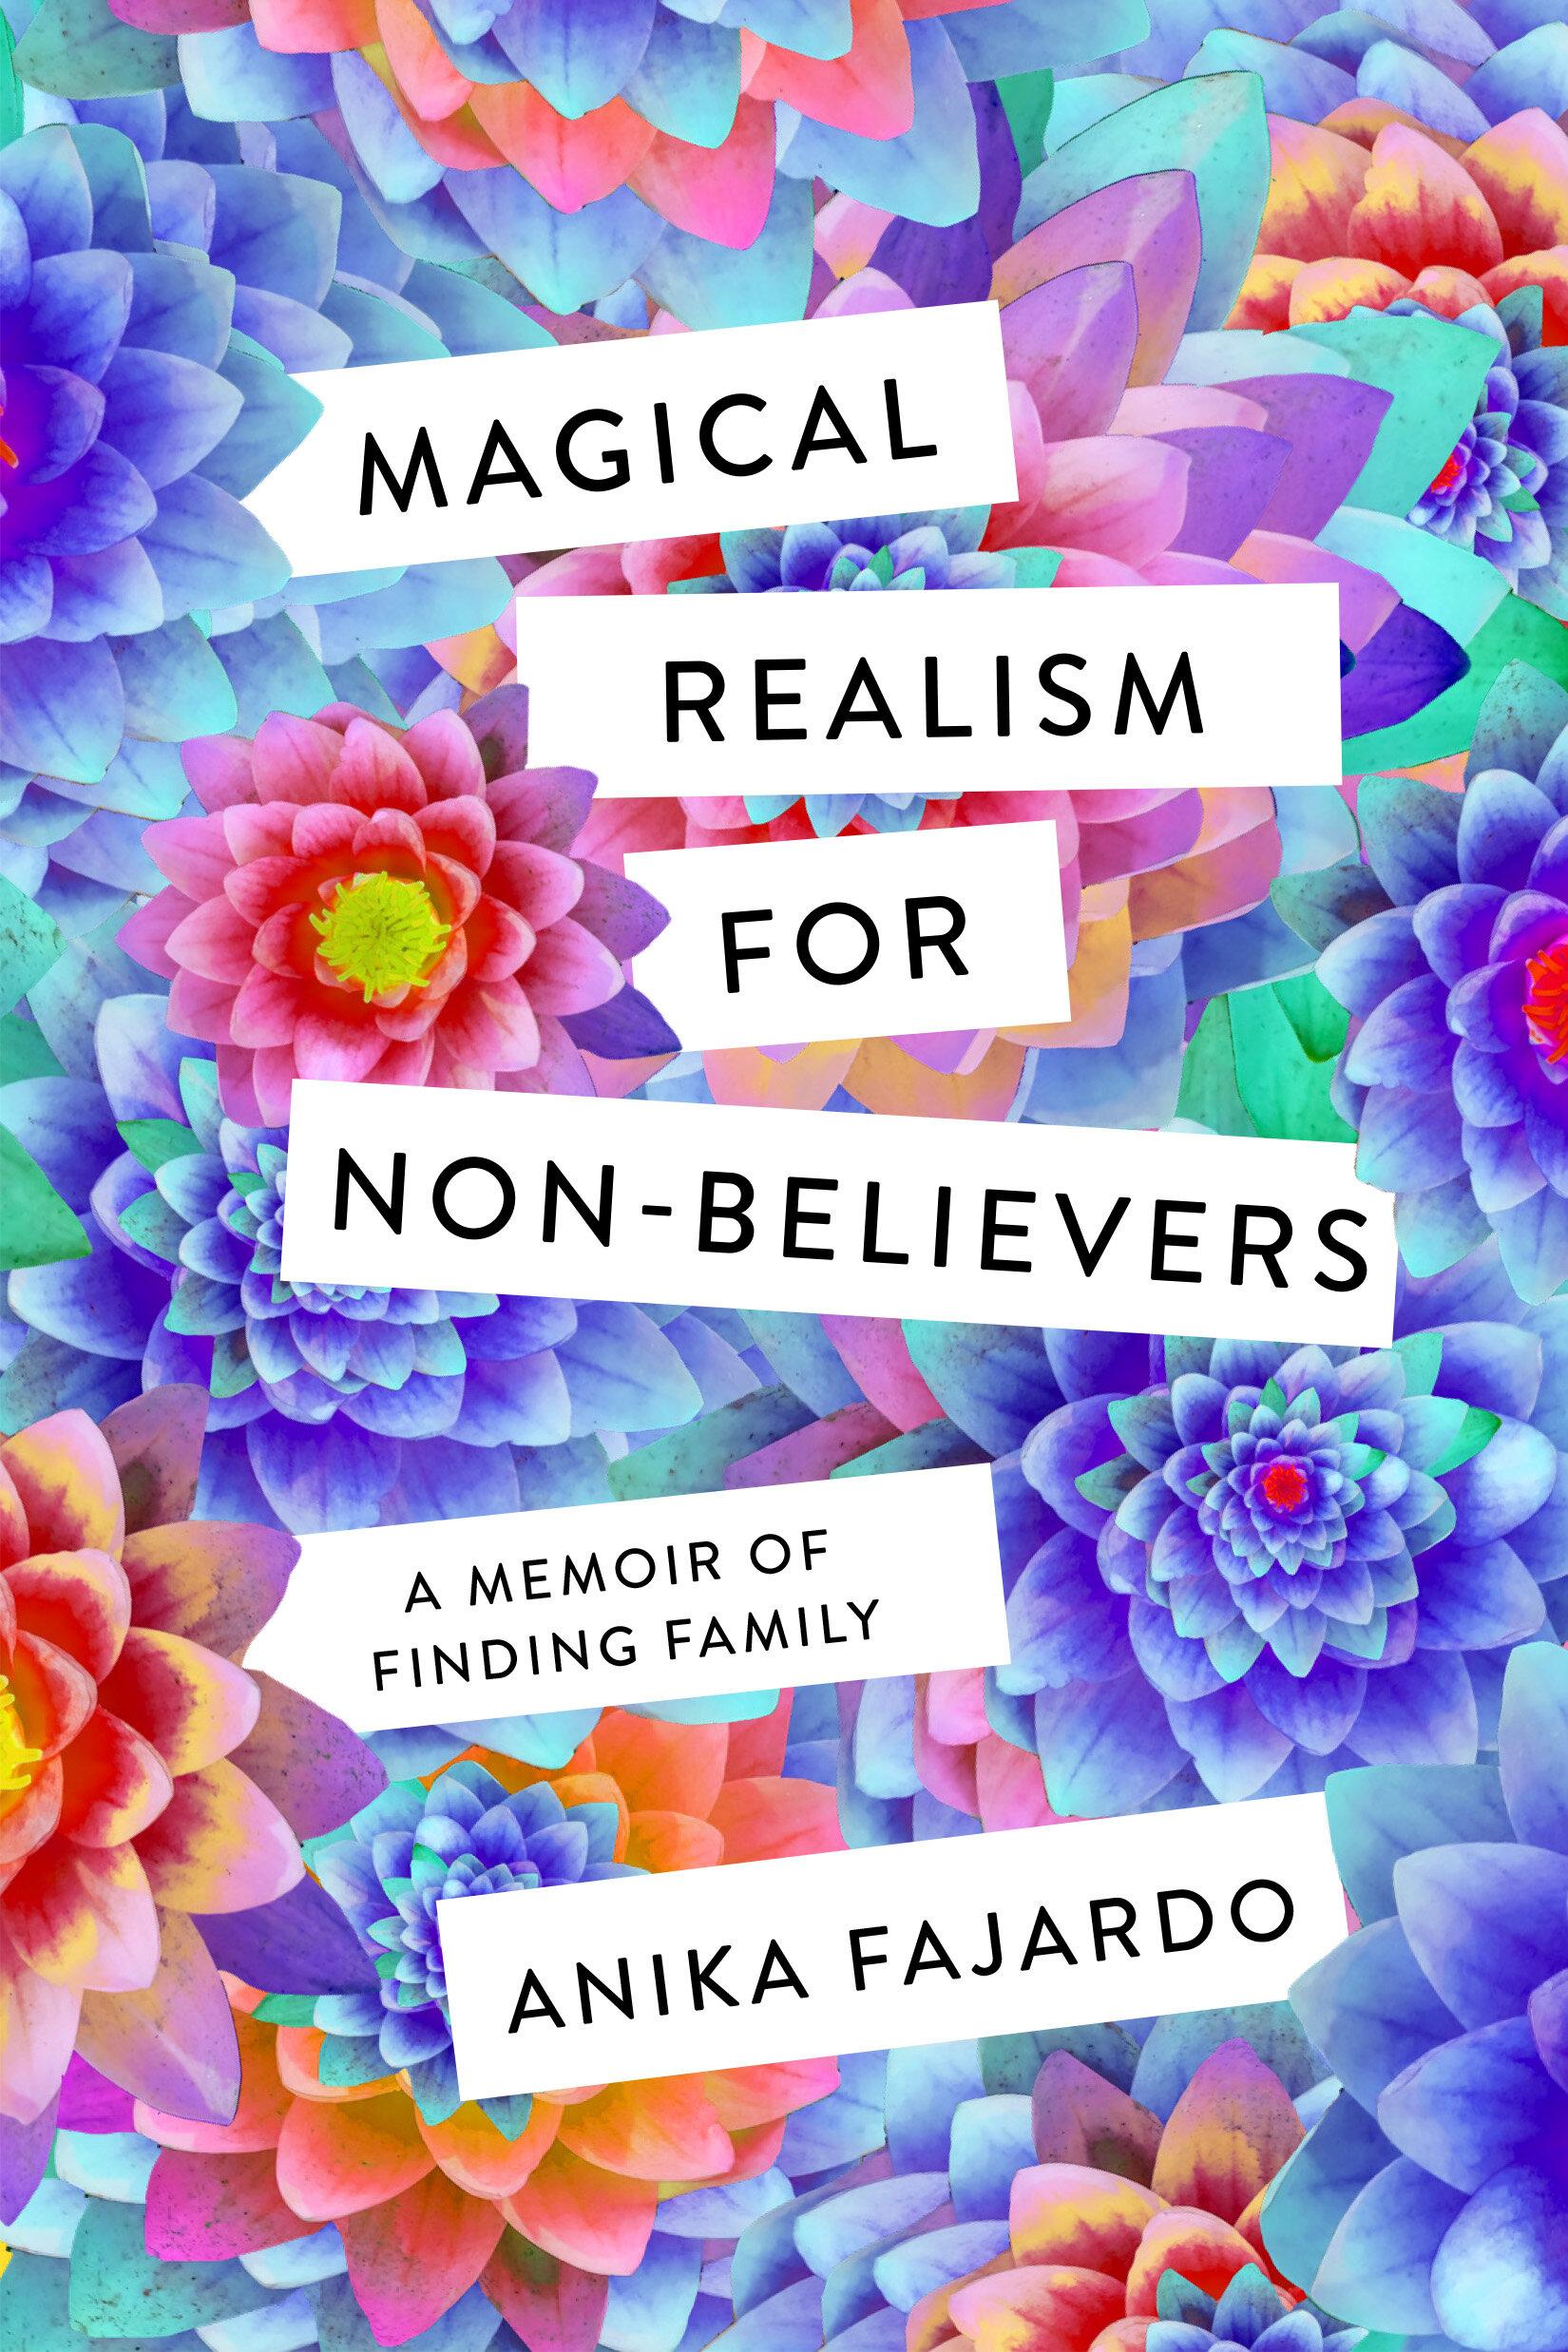 MagicalRealismforNonBelievers.jpg